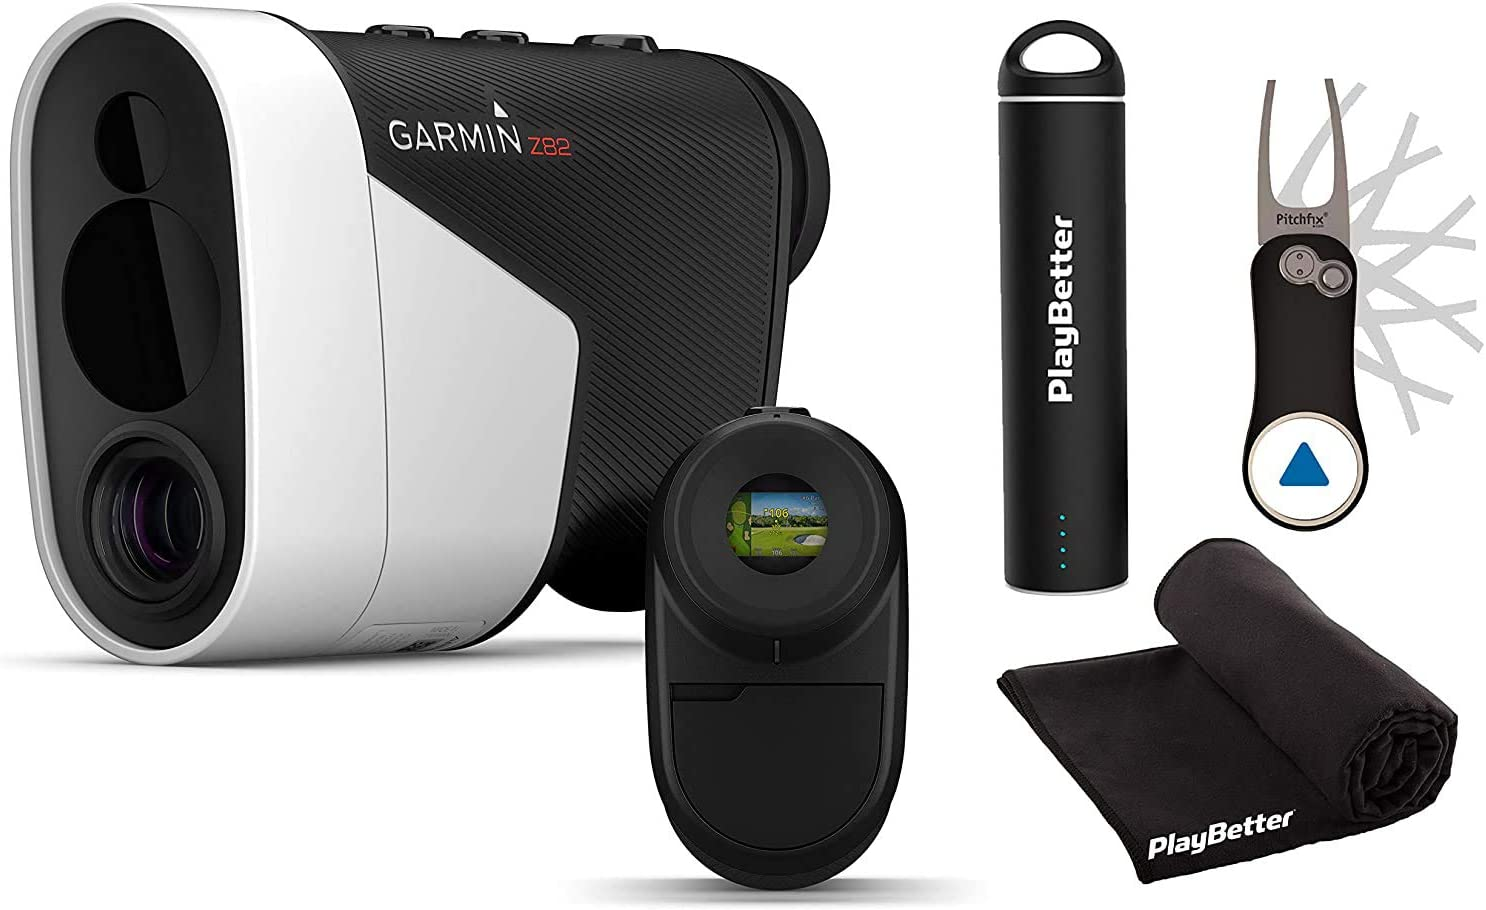 Garmin Approach Z82 (2020 Release) Player's Bundle | Hybrid Rangefinder/GPS, Image Stabilization, GreenView | +Garmin Pitchfix, PlayBetter Portable Charger & Microfiber Towel | Laser Golf Rangefinder